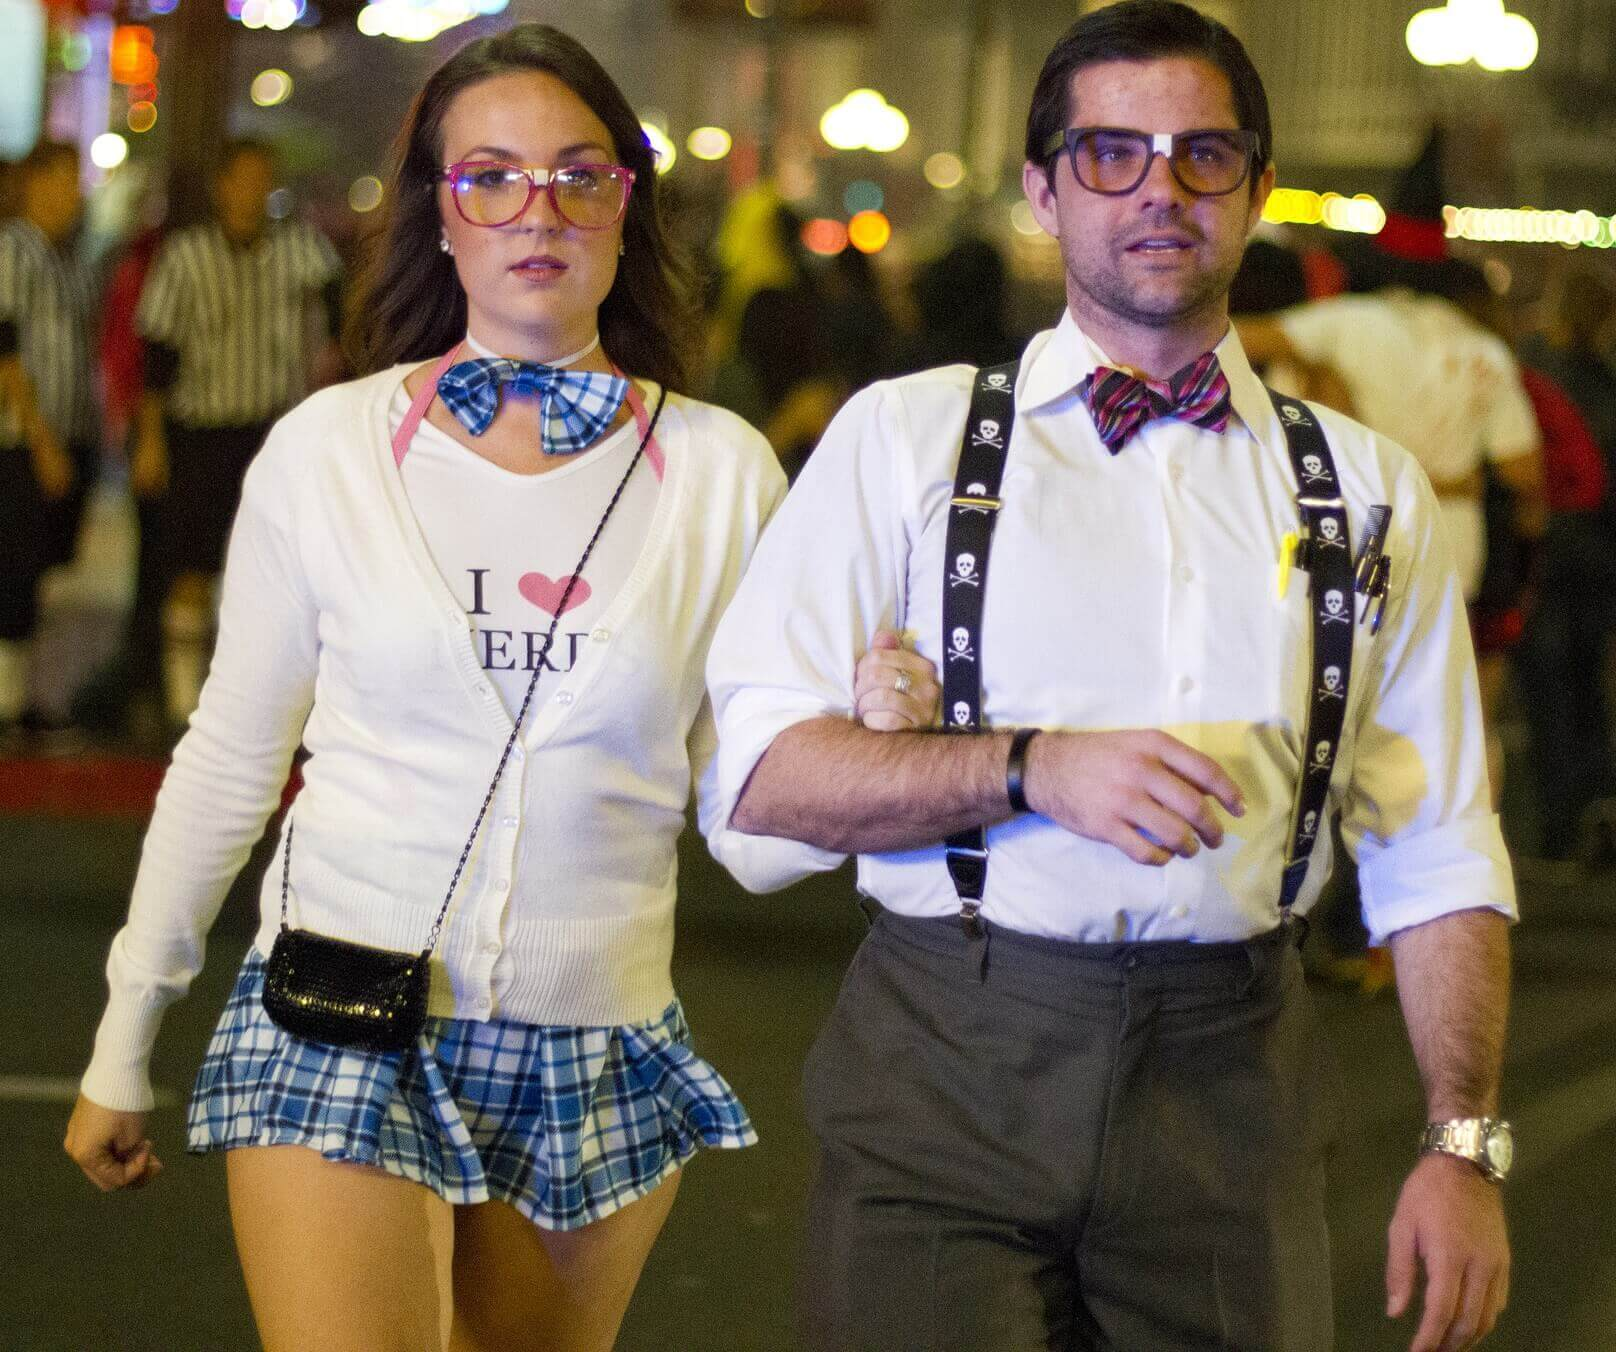 nerd party theme